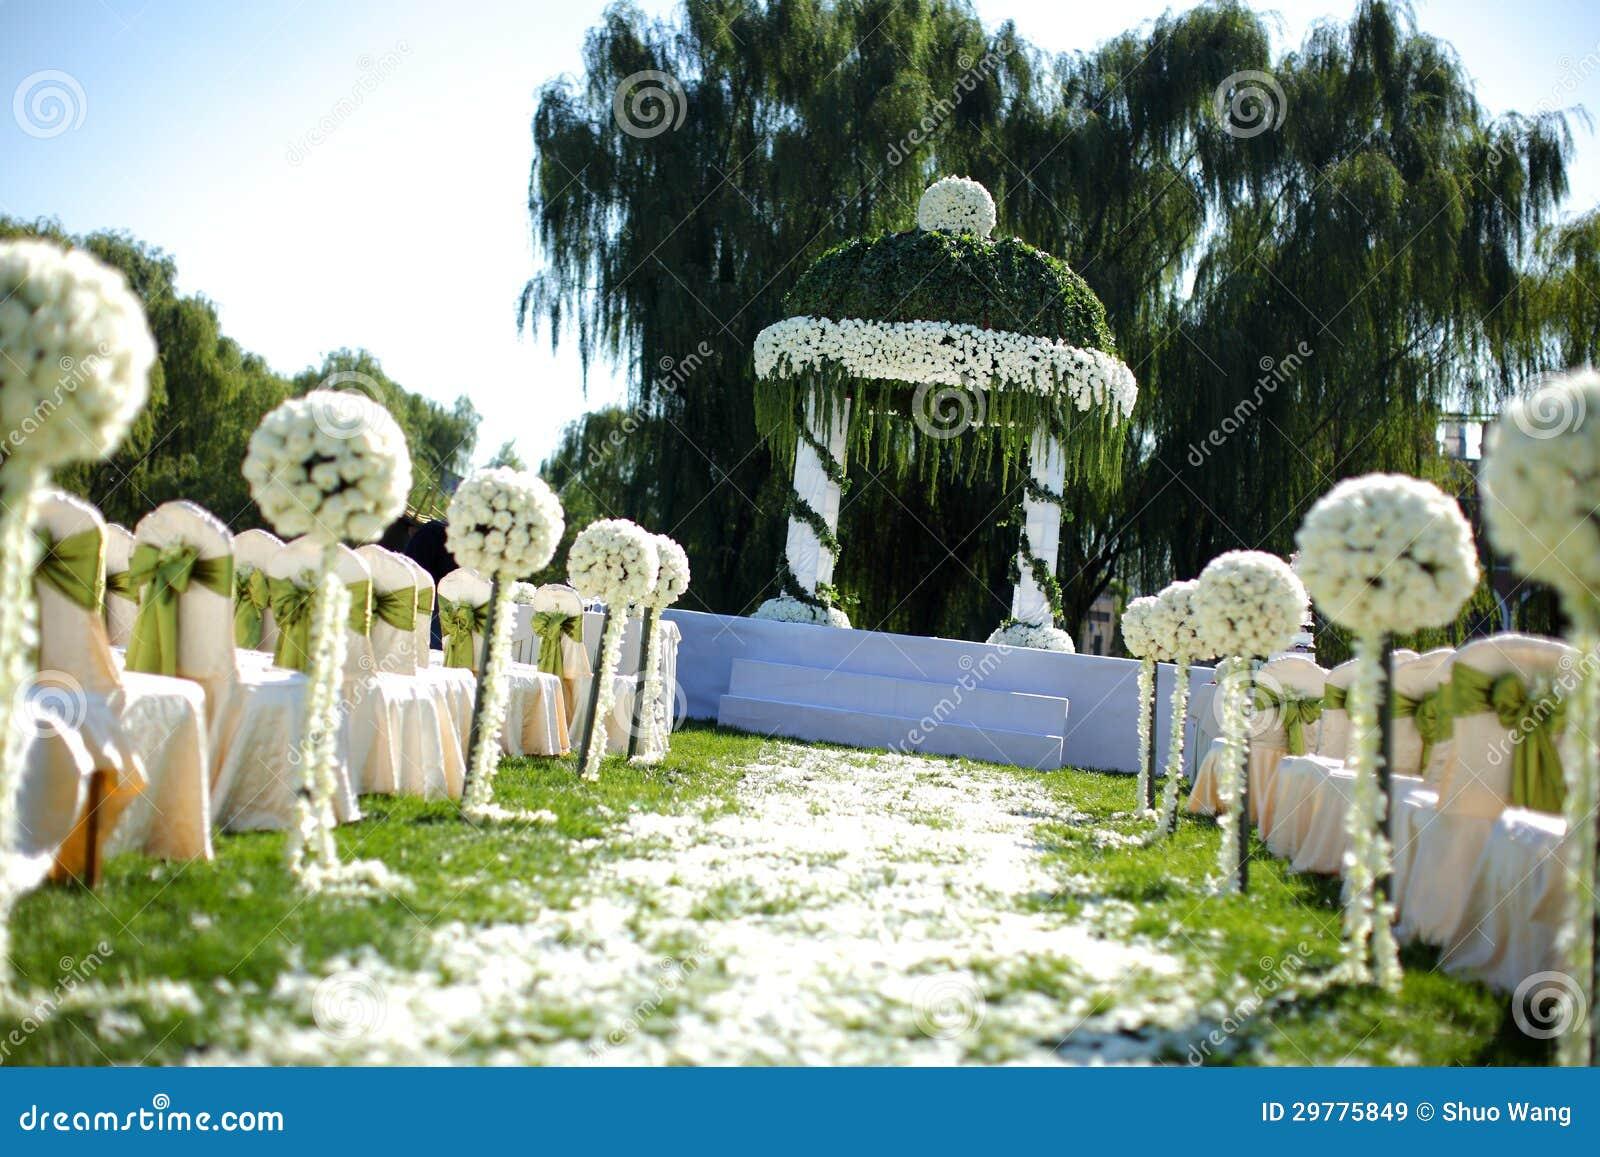 Hochzeit Szene Im Freien Lizenzfreie Stockbilder - Bild: 29775849